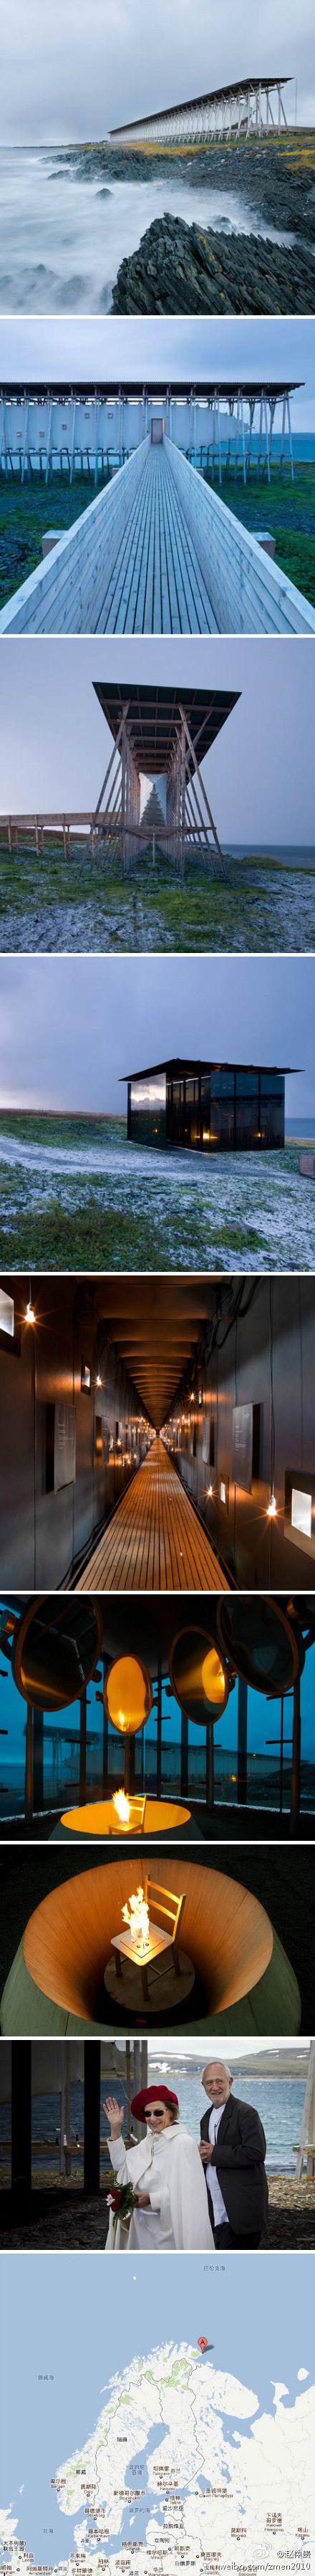 Steilneset Memorial in Vardø, Norway by Peter Zumthor and Louise Bourgeois